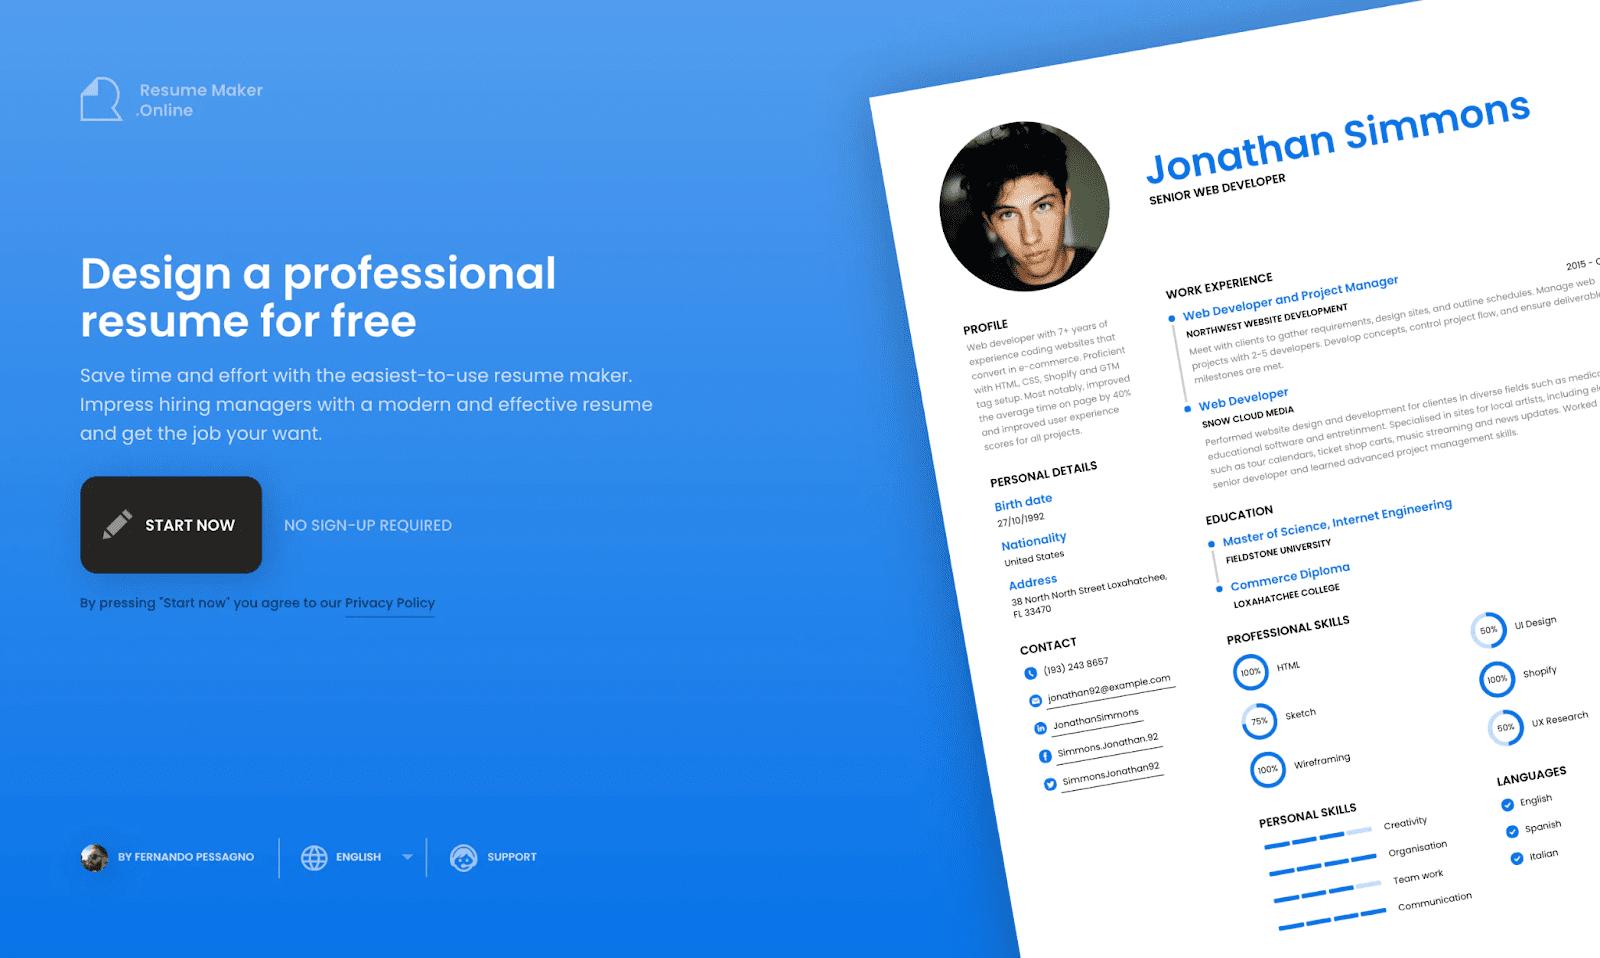 ResumeMaker Landing Page